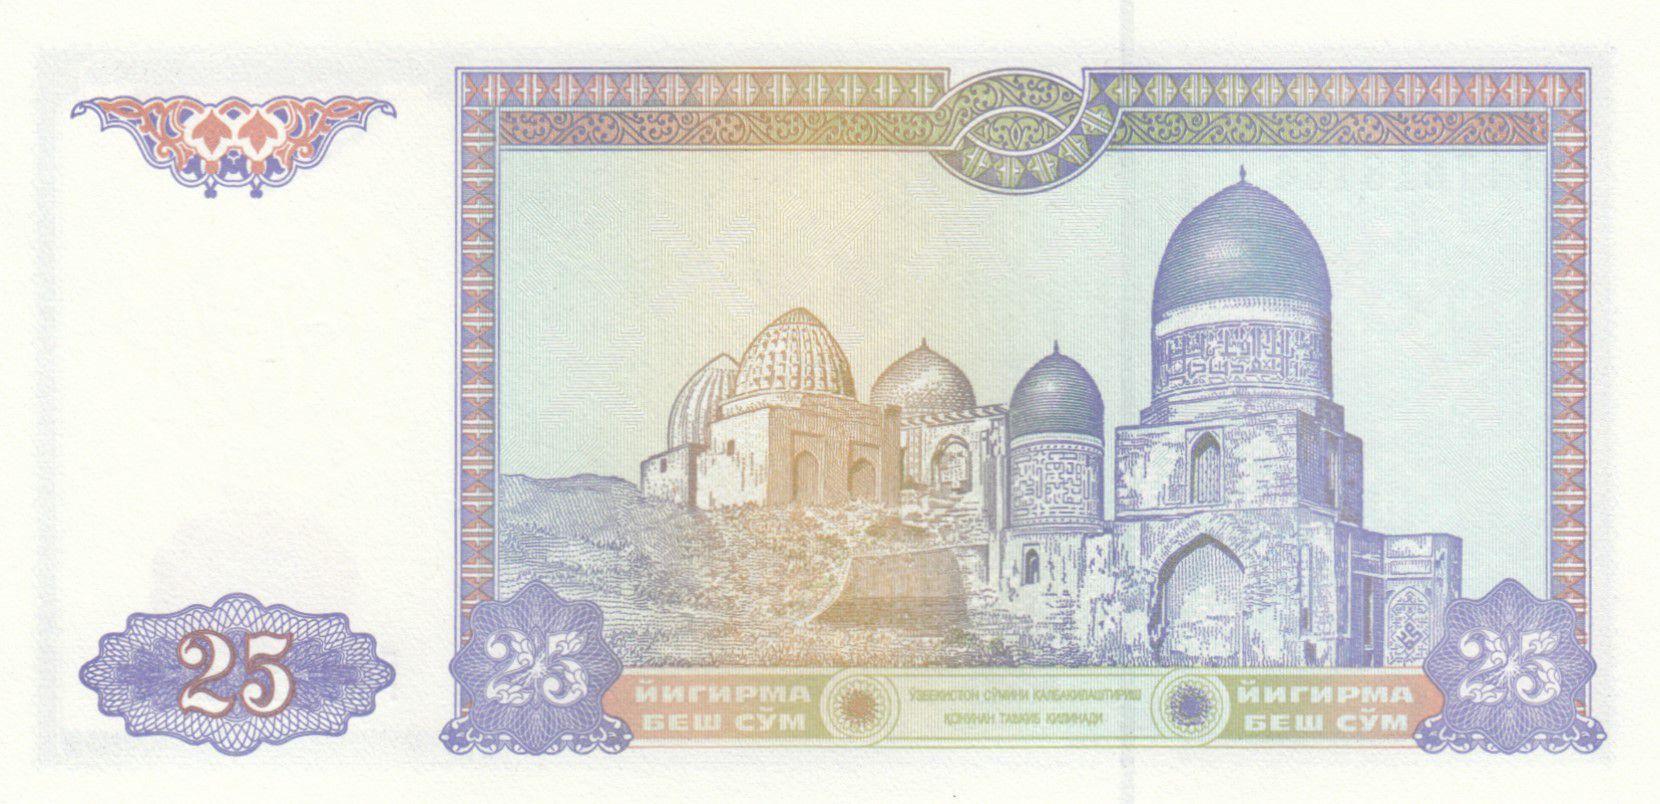 Uzbekistan 25 Sum 1994 - Coat of Arms, Samarkand\'s Mausoleum